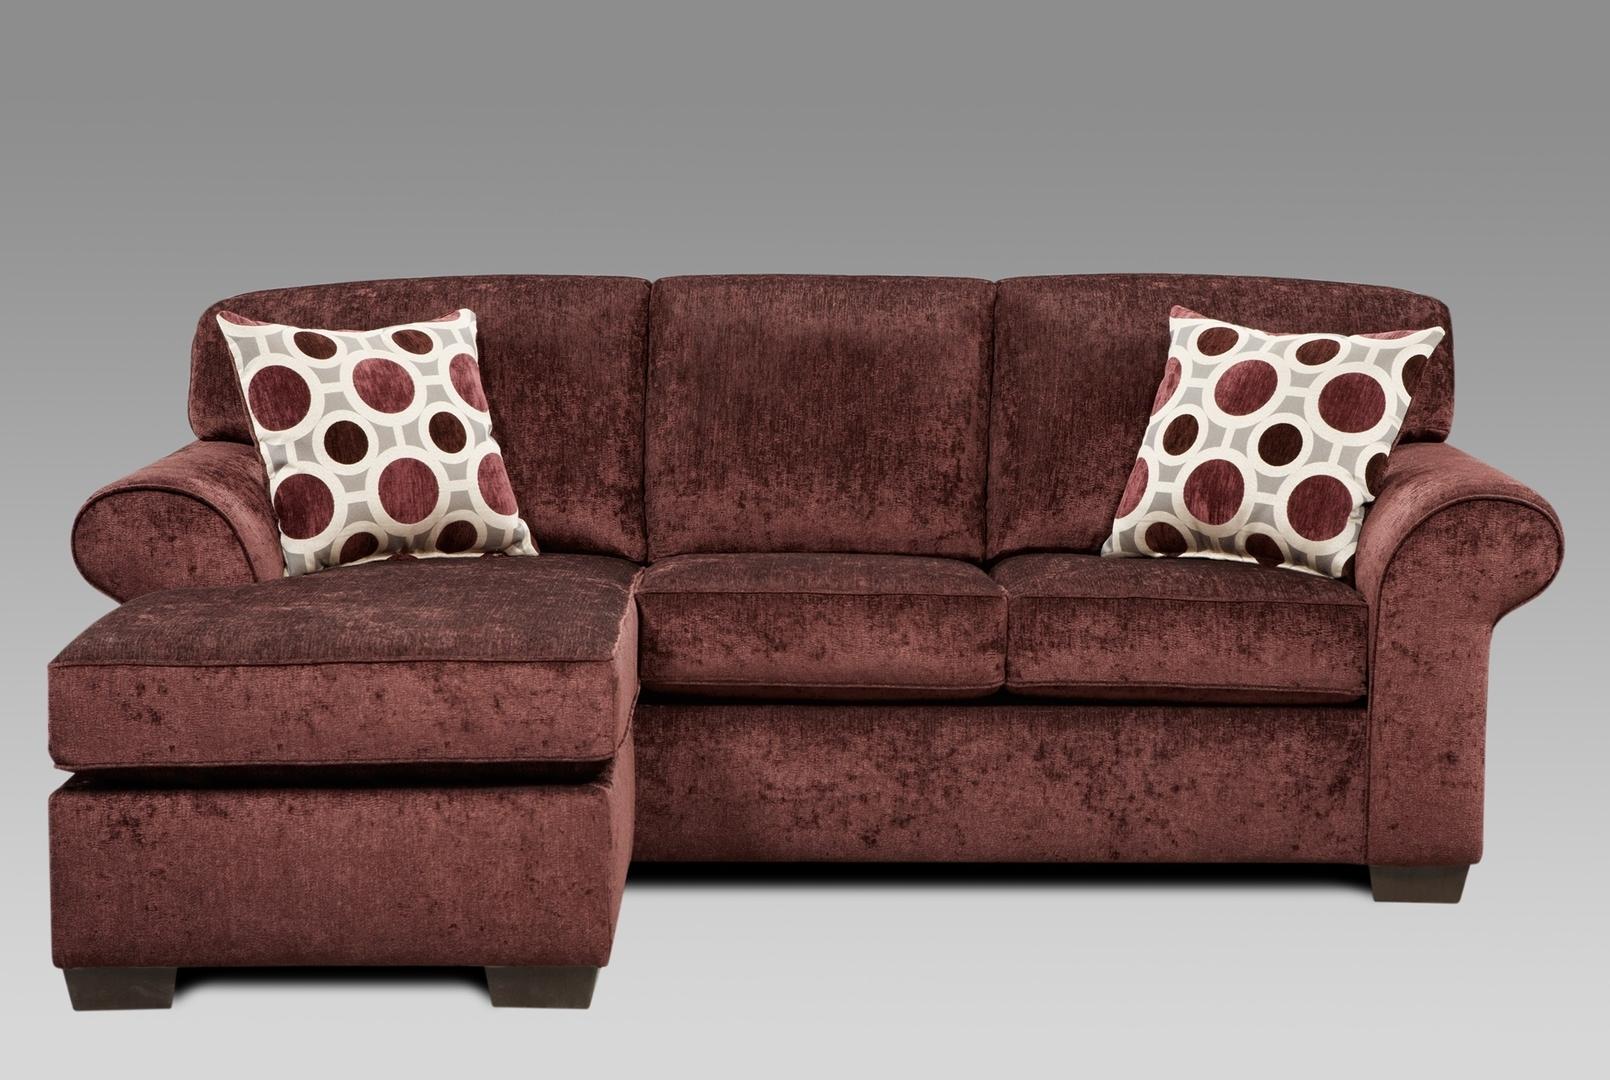 Well Liked Tuscaloosa Sectional Sofas Regarding Sofas: Tuscaloosa, Al: Southeastern Furniture (View 18 of 20)